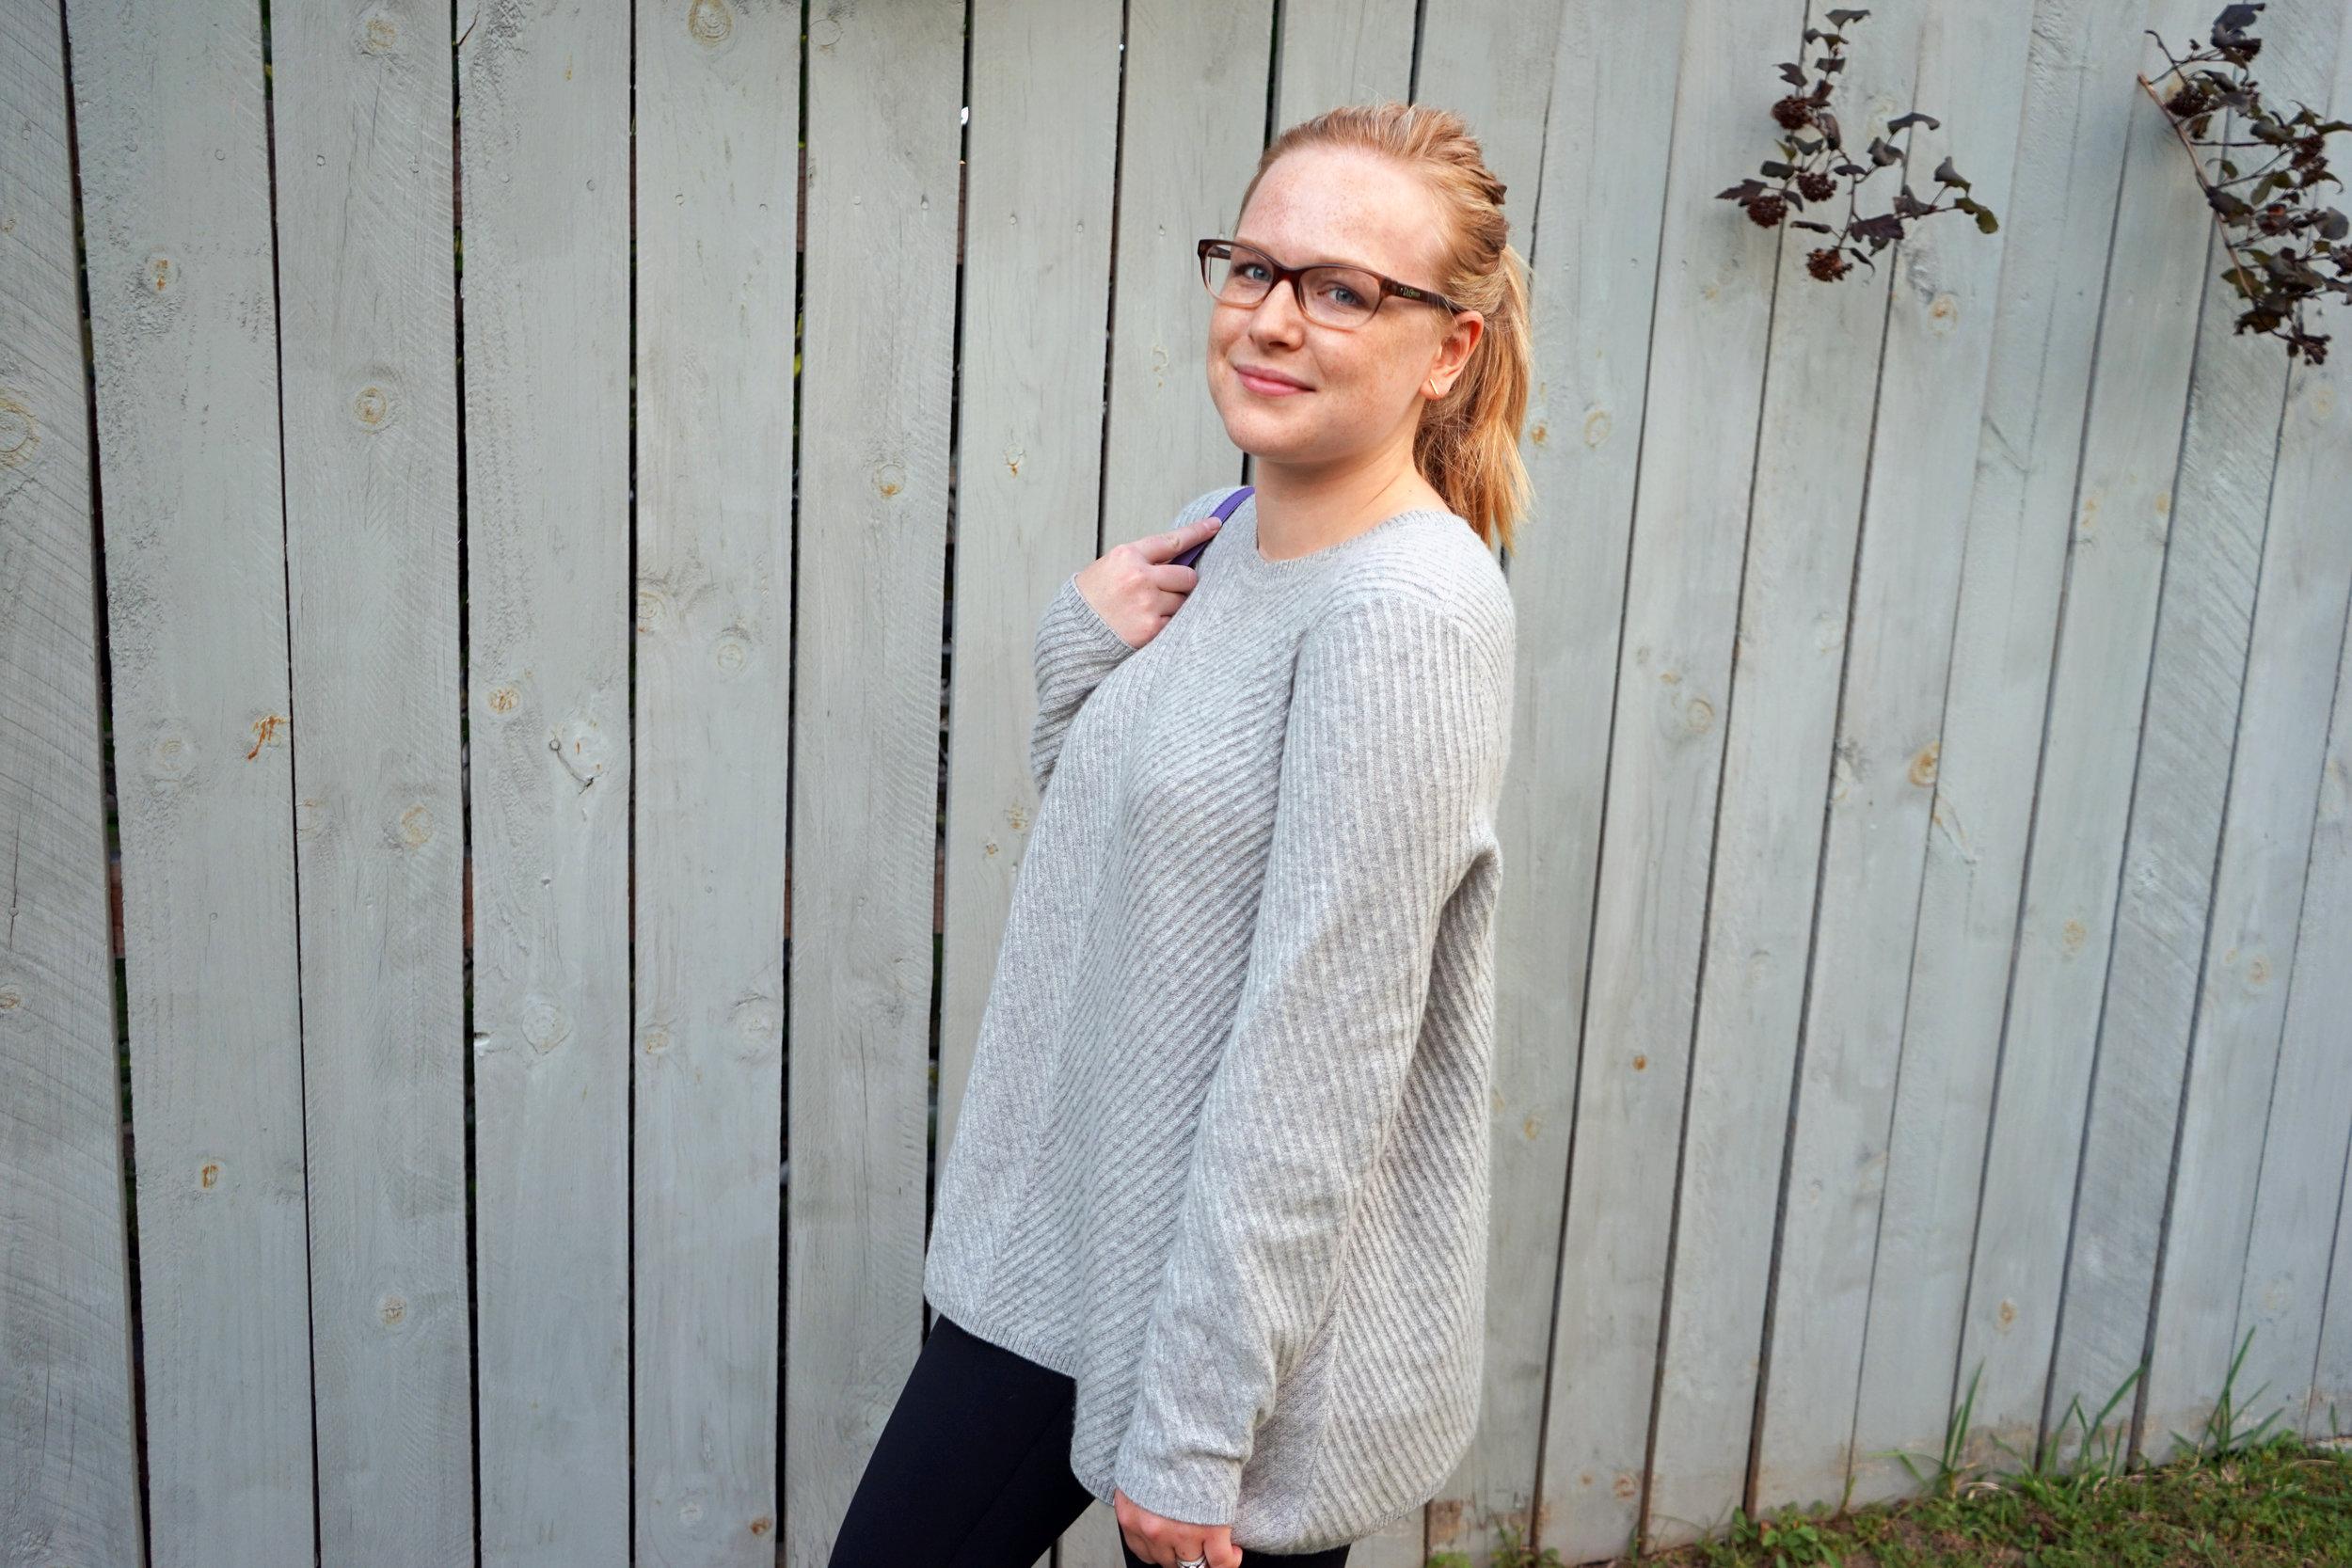 Maggie a la Mode - Nordstrom Signature Collection Chevron Cashmere Sweater, Zella Live-In High Waist Leggings, Soludos Classic Striped Espadrilles, Kate Spade Cedar Street Maise Satchel